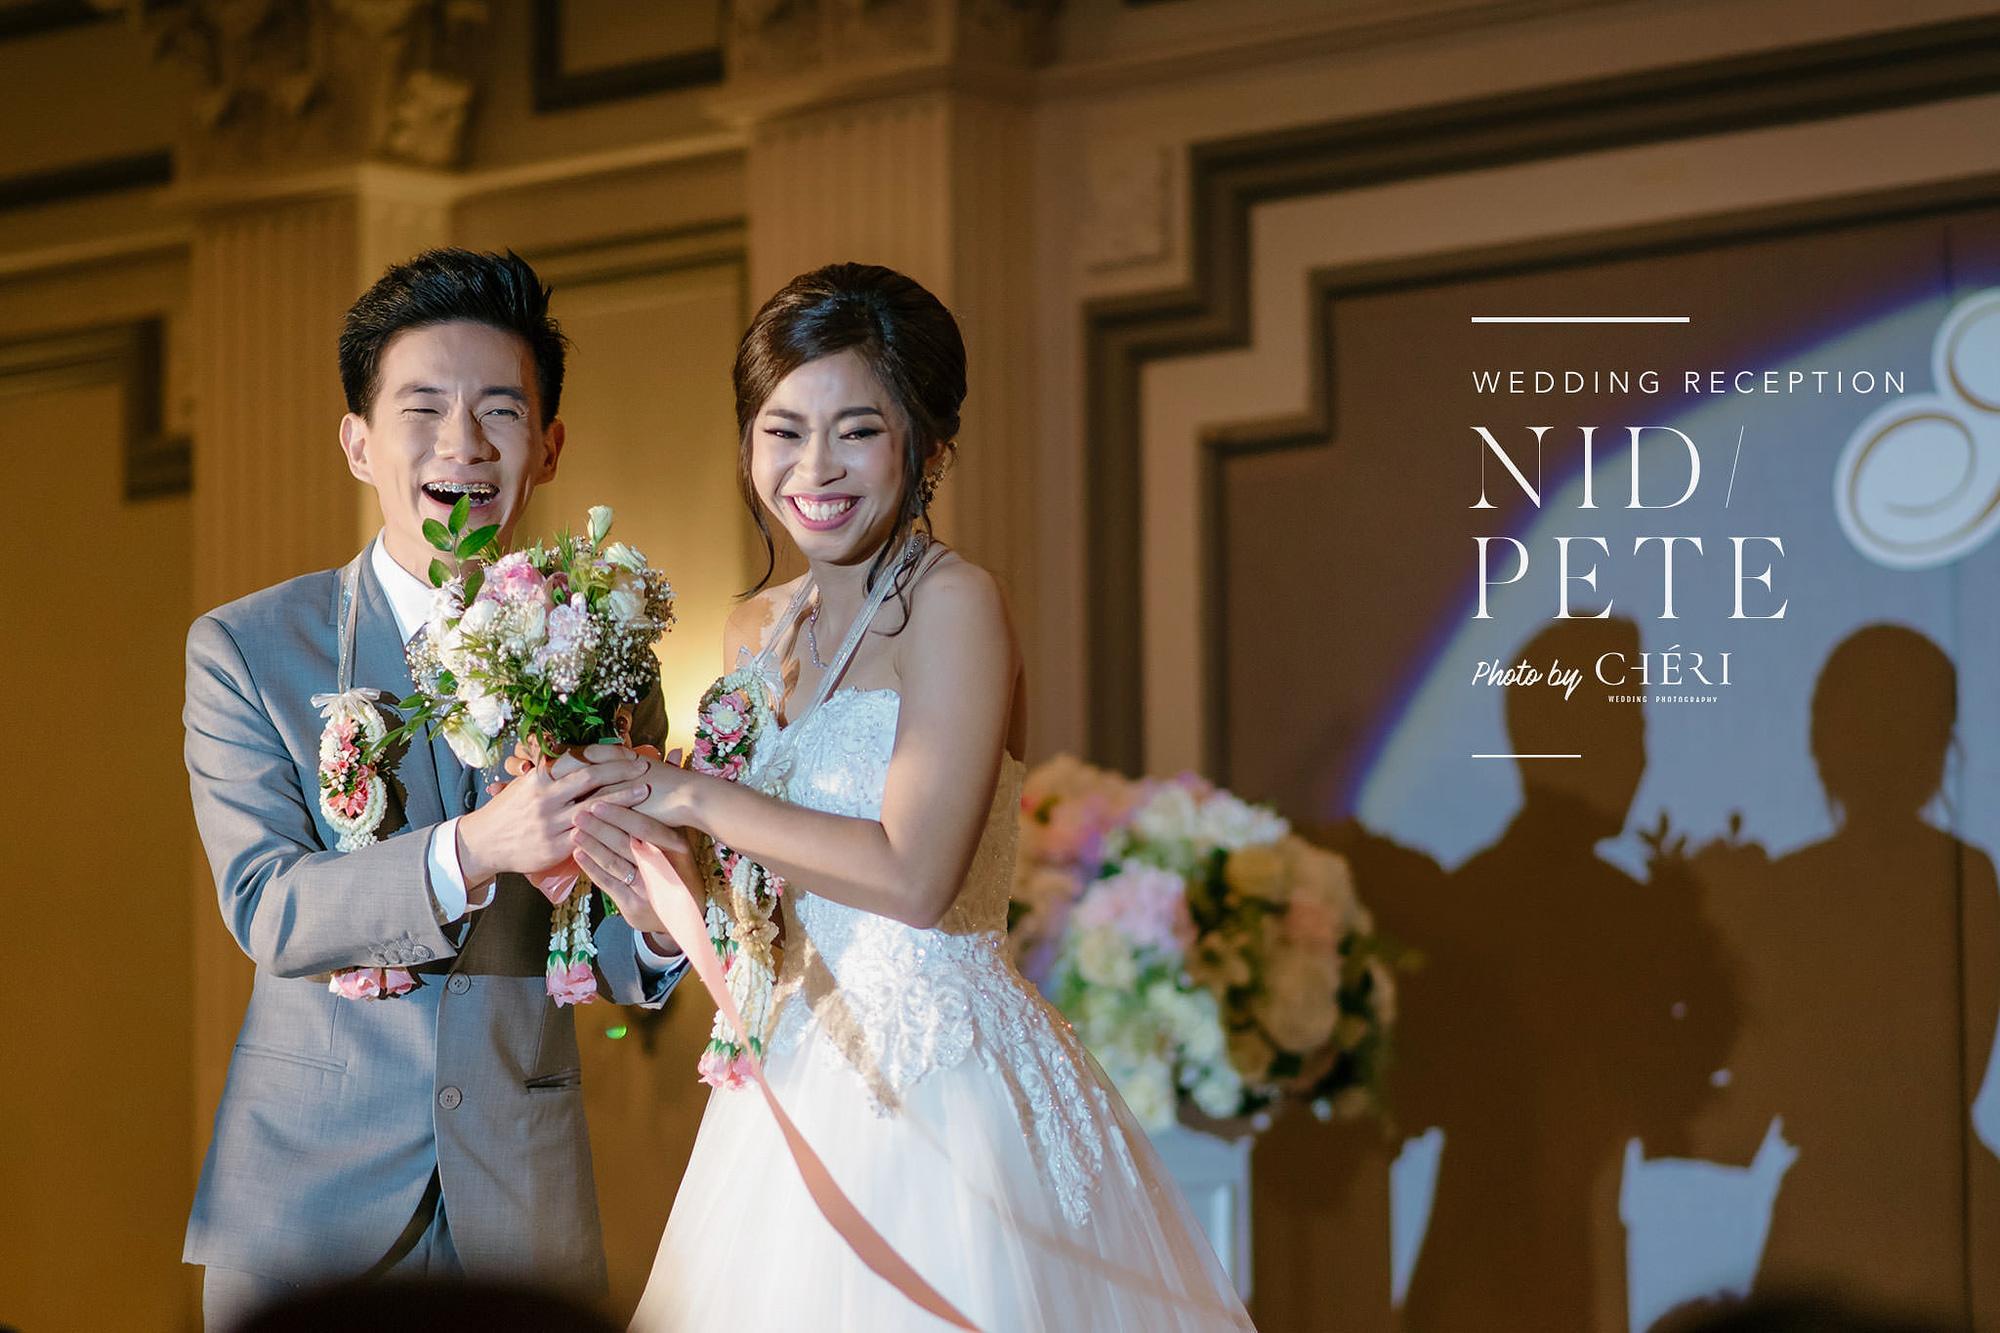 narai hotel silom bangkok wedding reception pete nid cover 1